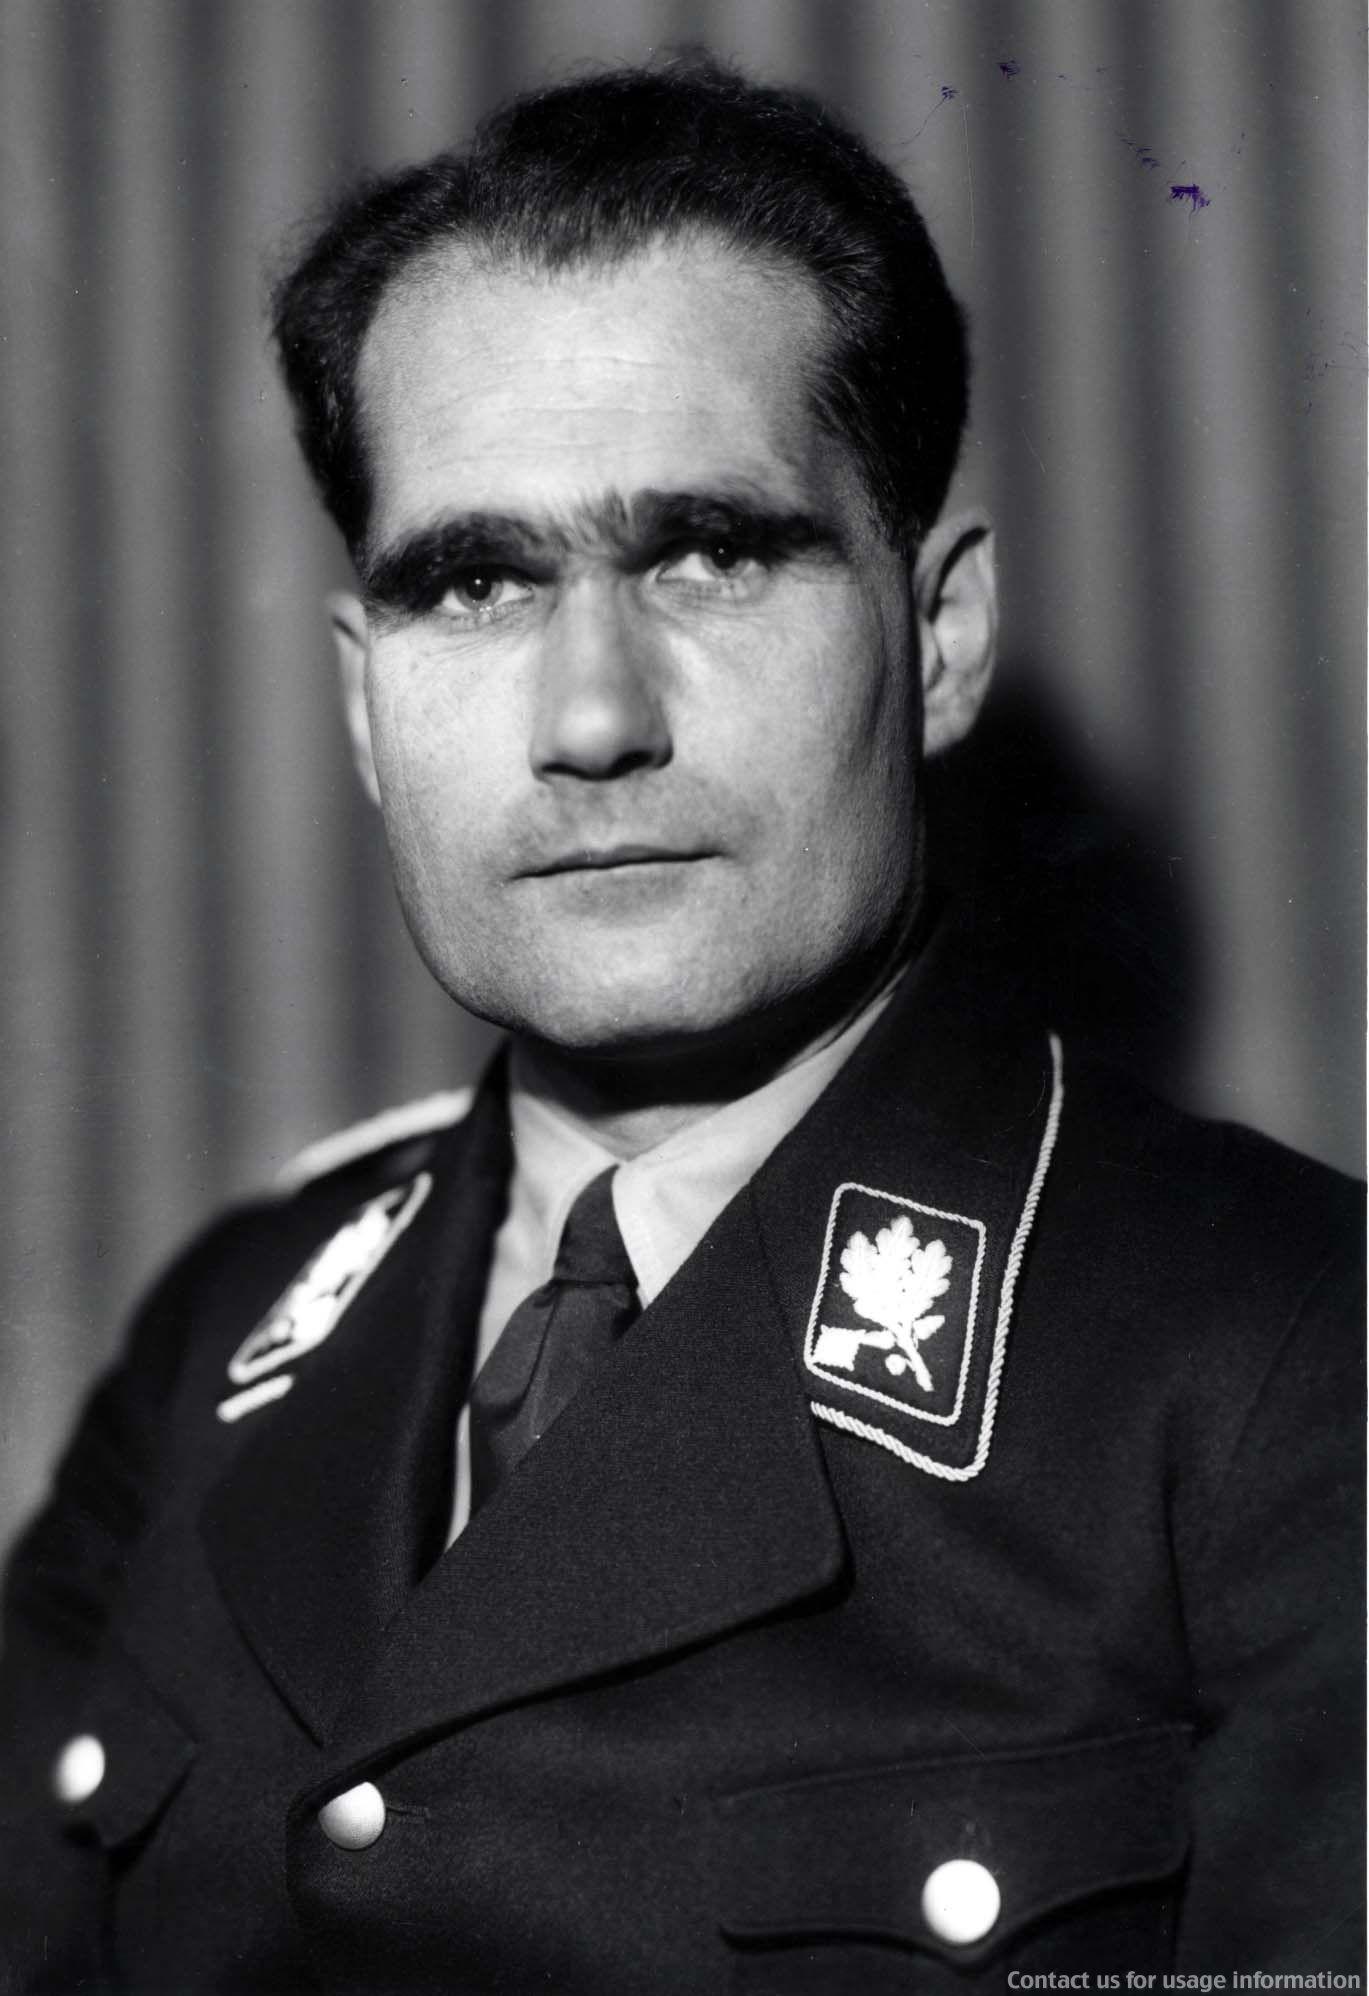 rudolf hess appointed deputy f252hrer to adolf hitler in